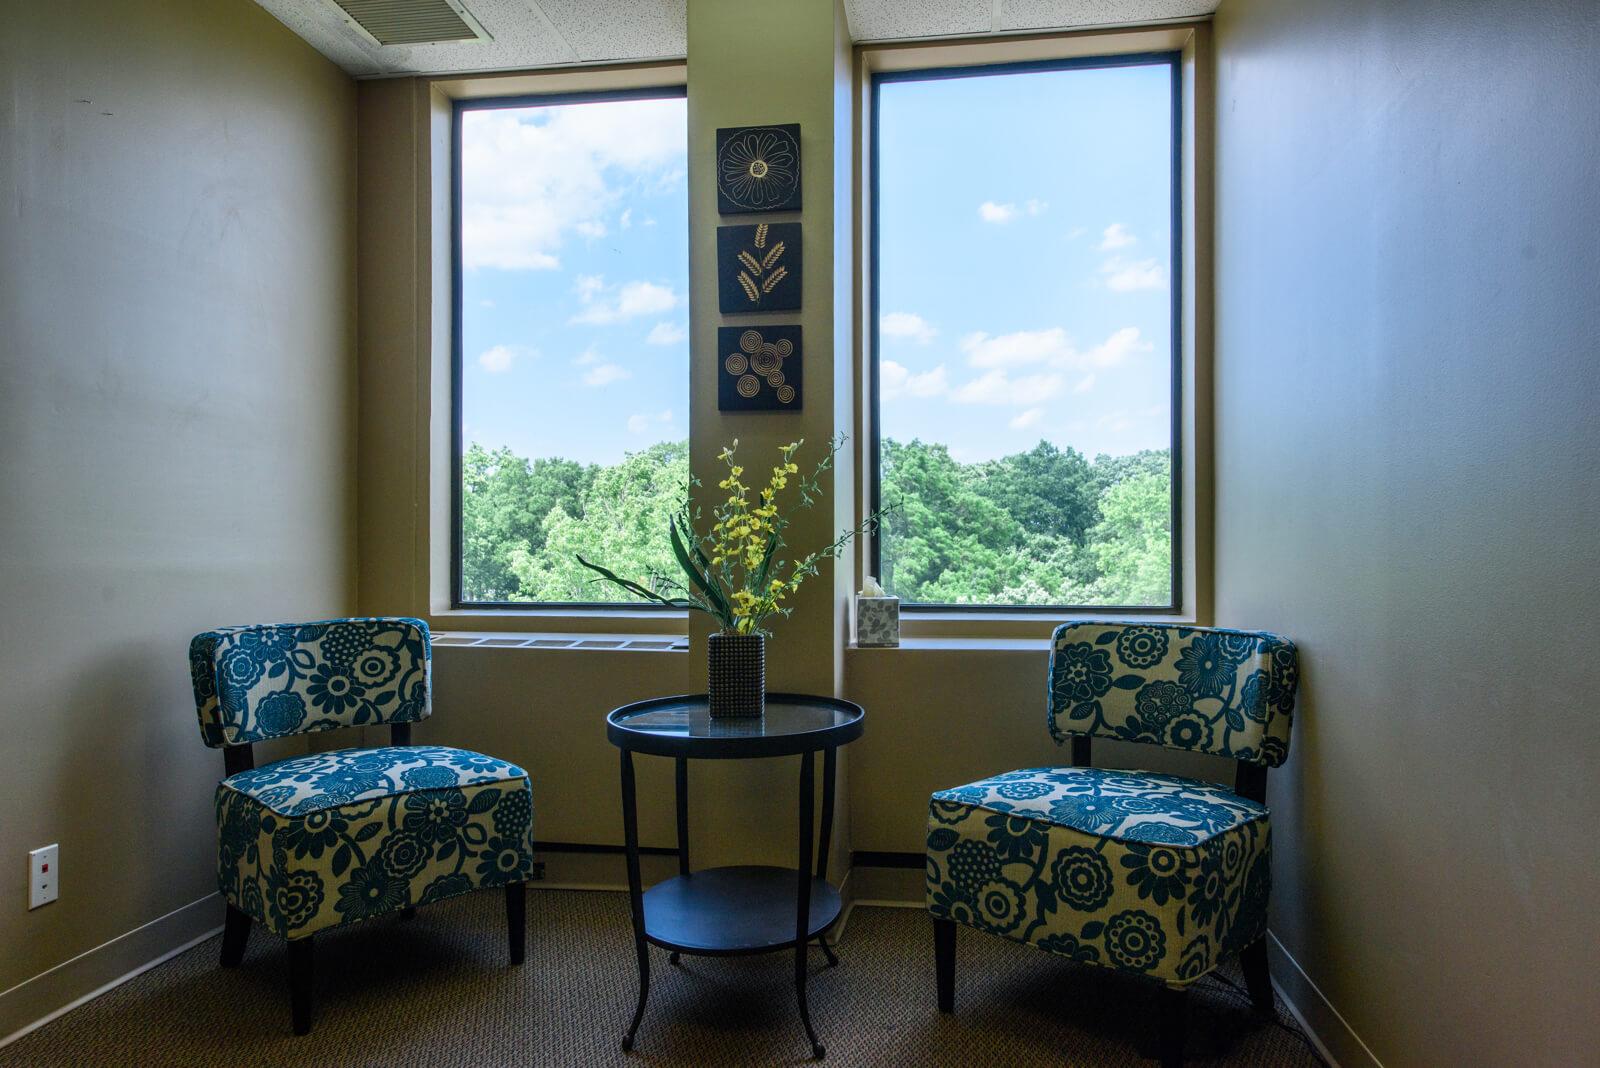 Views at 1010 Lake Street, Oak Park office spaces